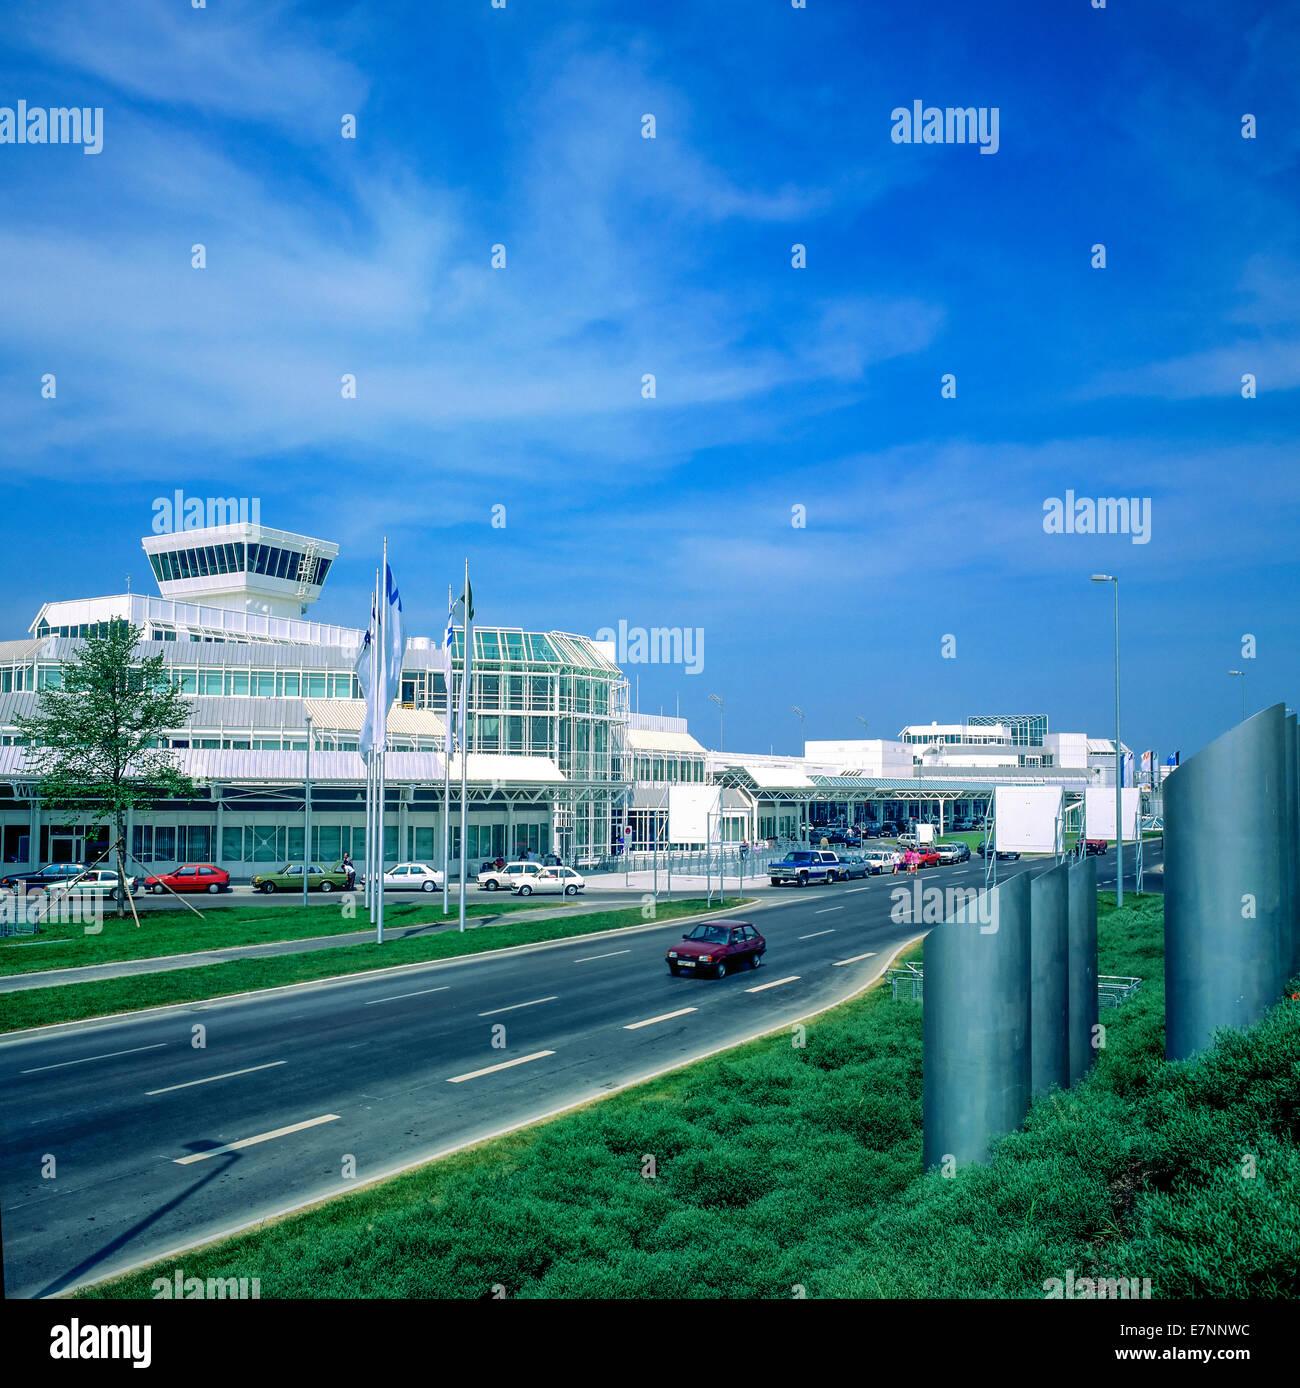 Franz-Joseph Strauss airport Munich Bavaria Germany - Stock Image